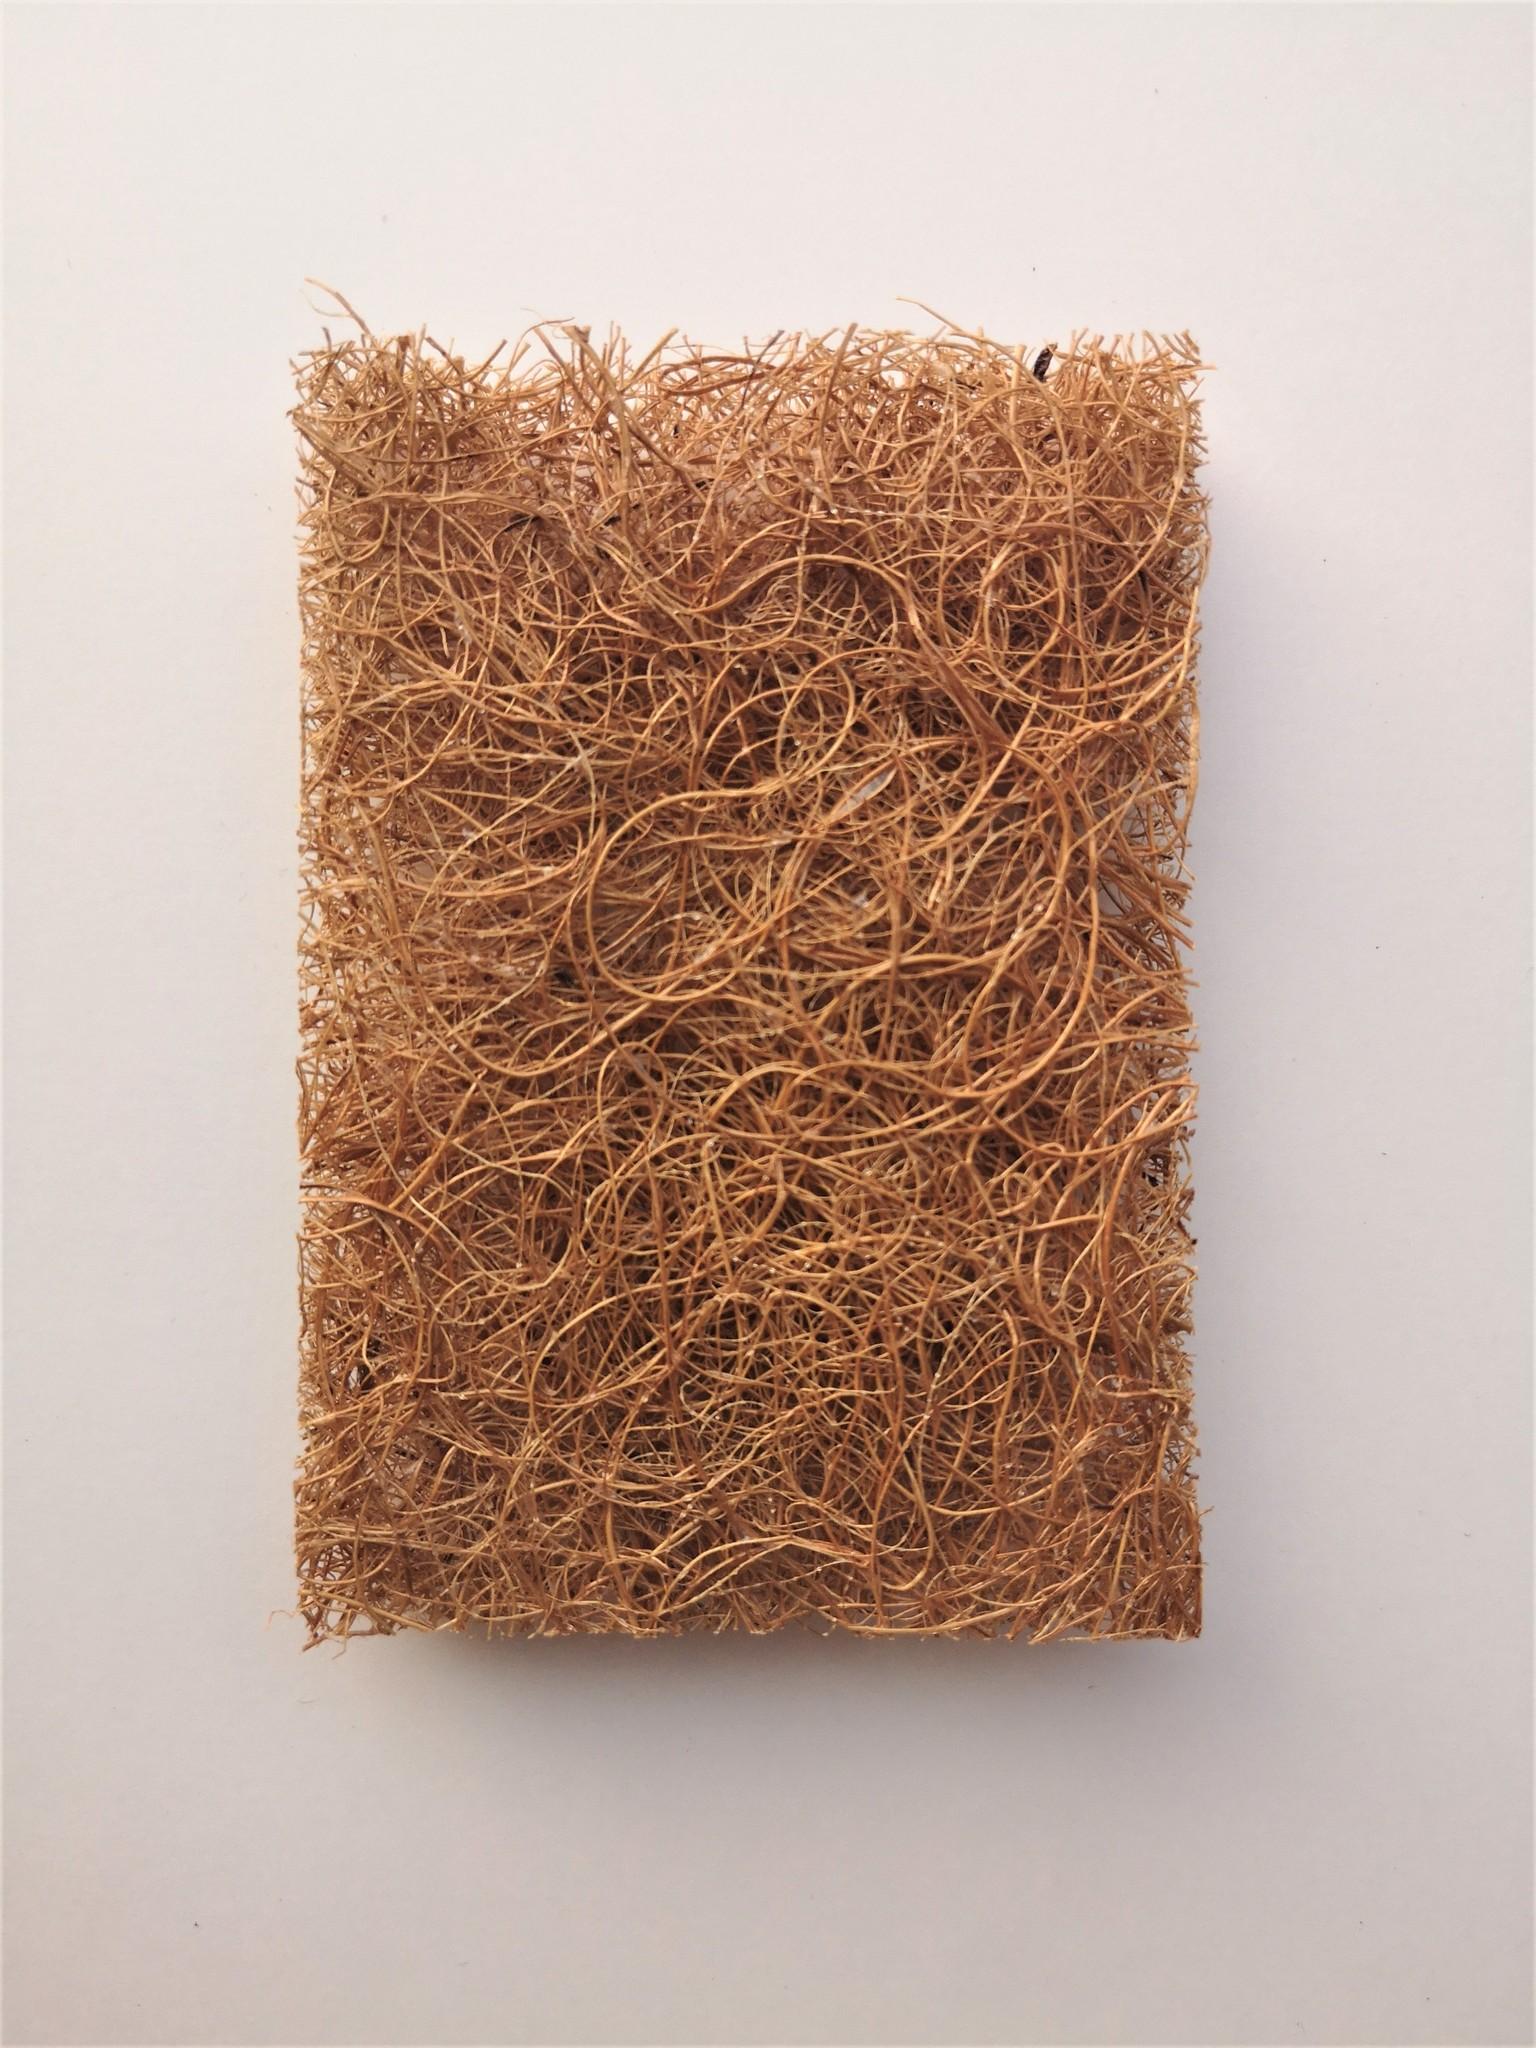 Krasvrije Schuurspons van kokosvezel-3